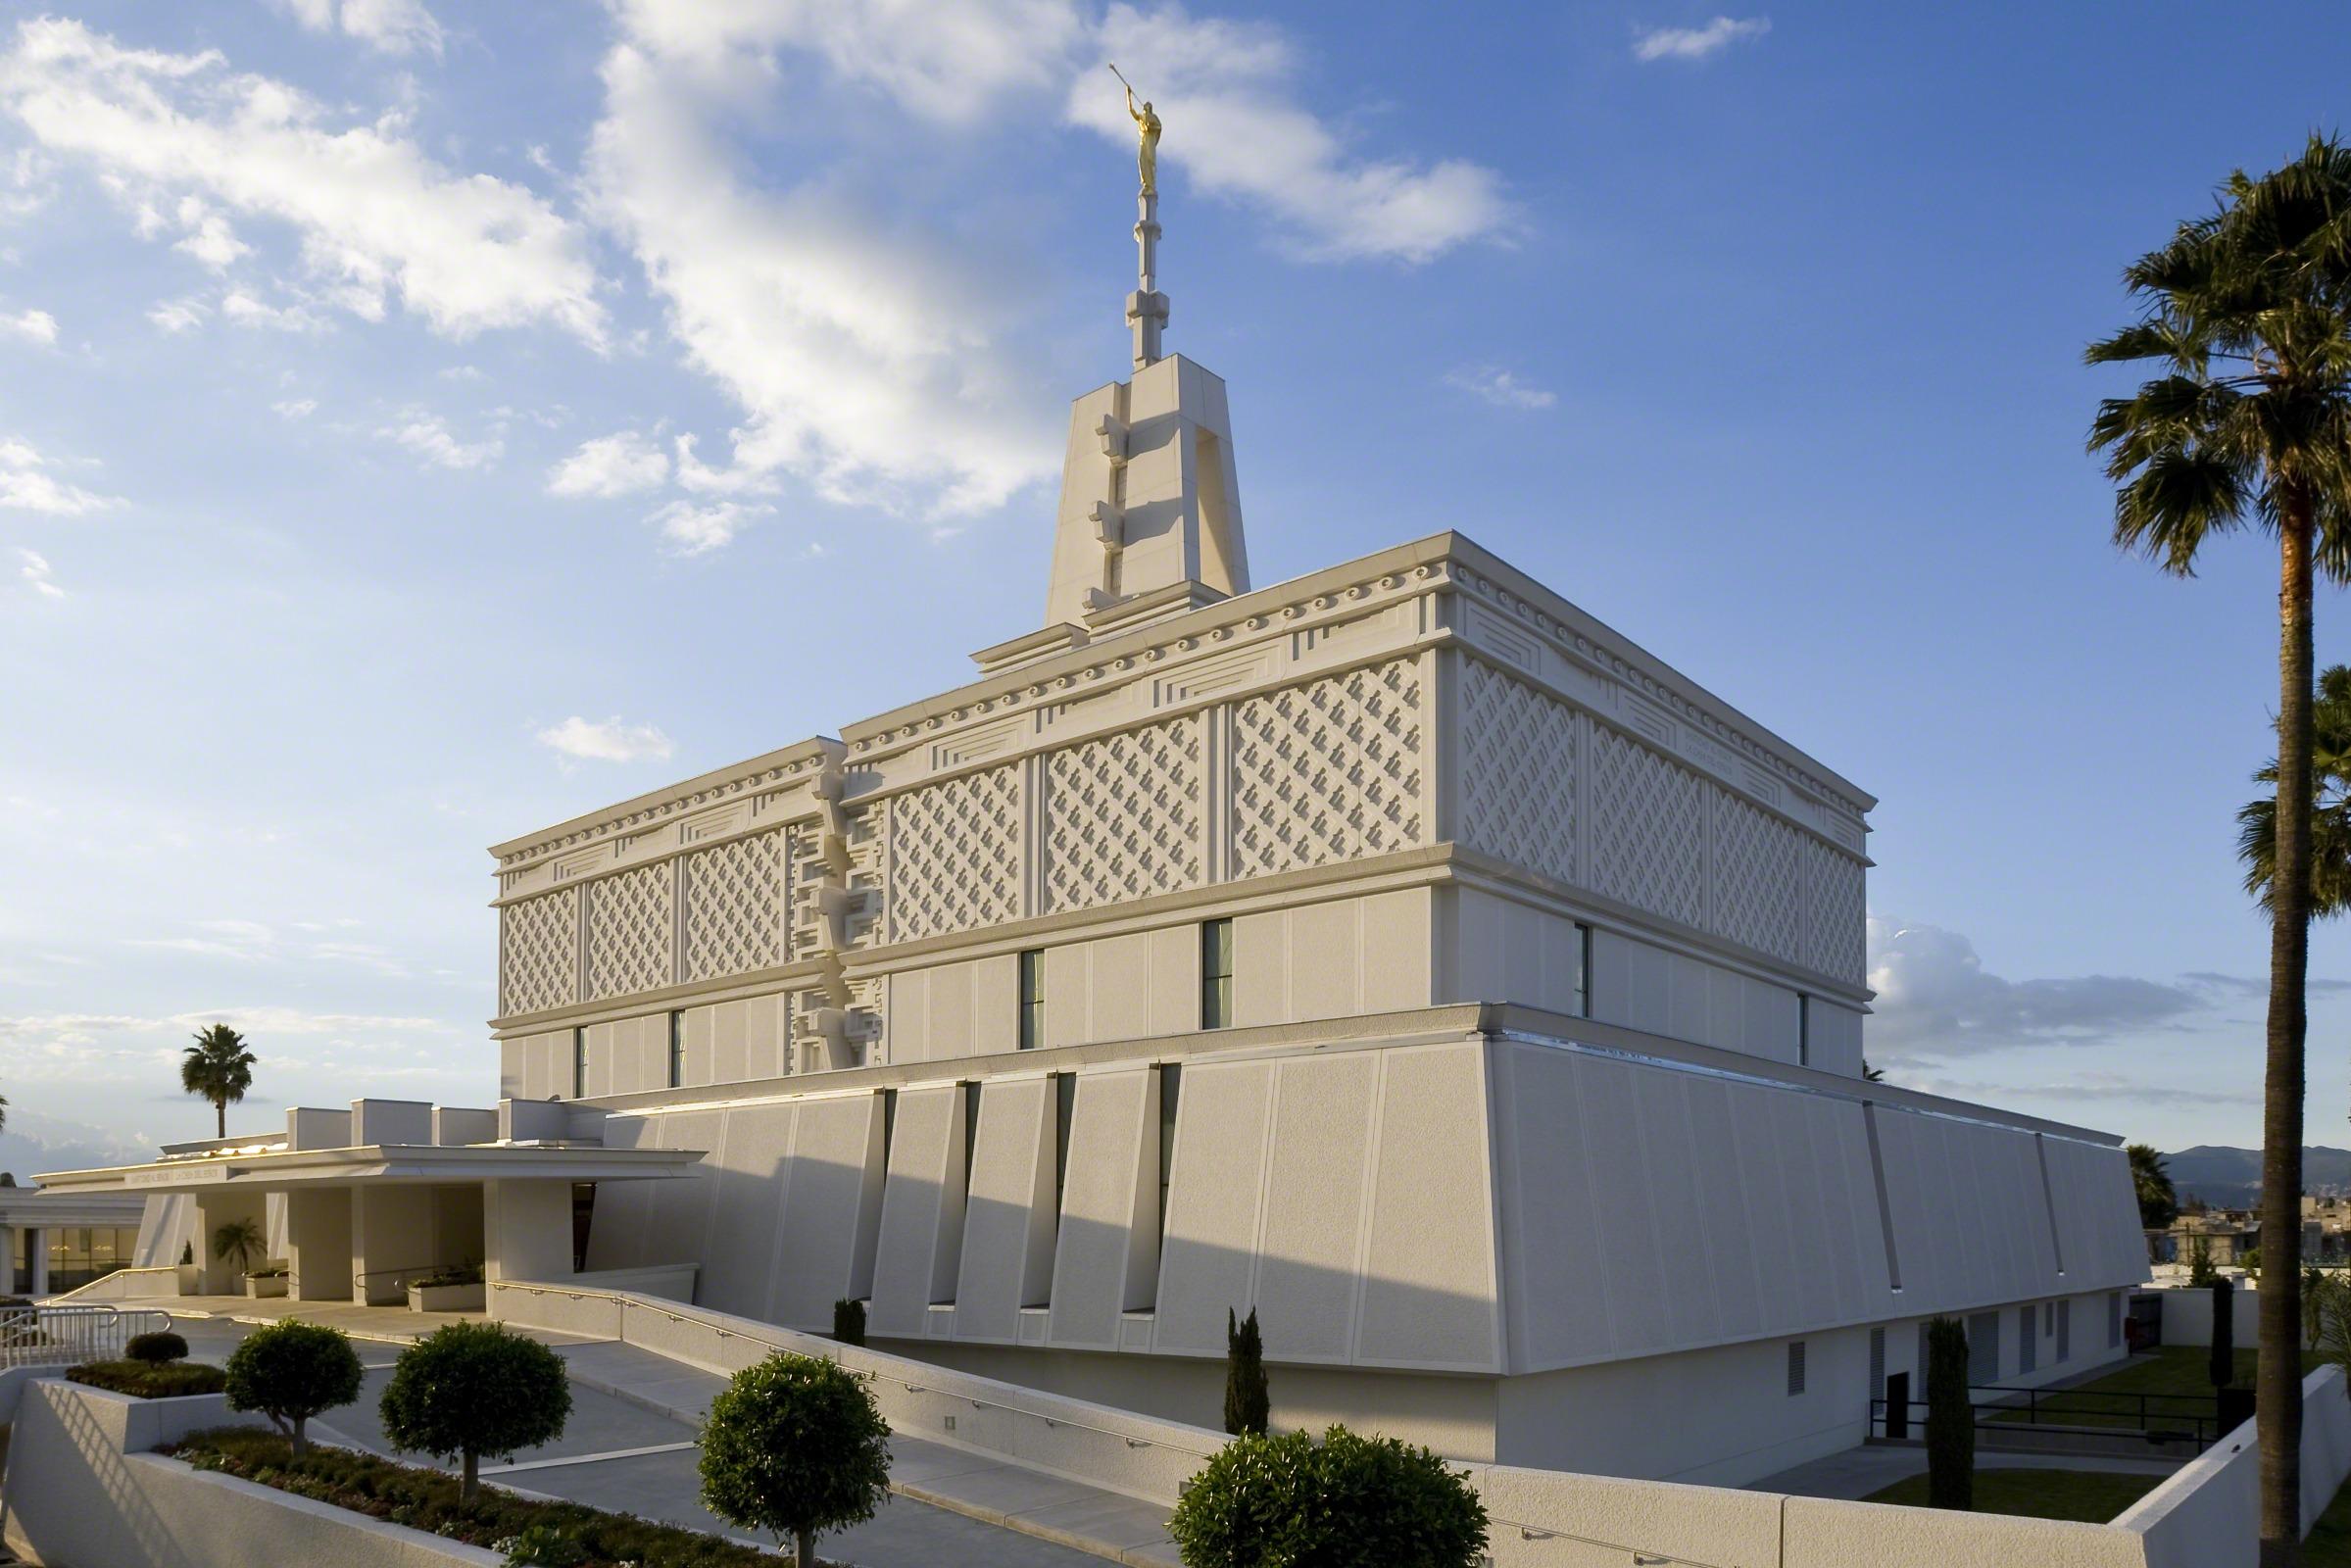 The Church of Jesus Christ of Latter-day Saints - Lebanon Oregon | 1955 S 5th St, Lebanon, OR, 97355 | +1 (541) 258-3686